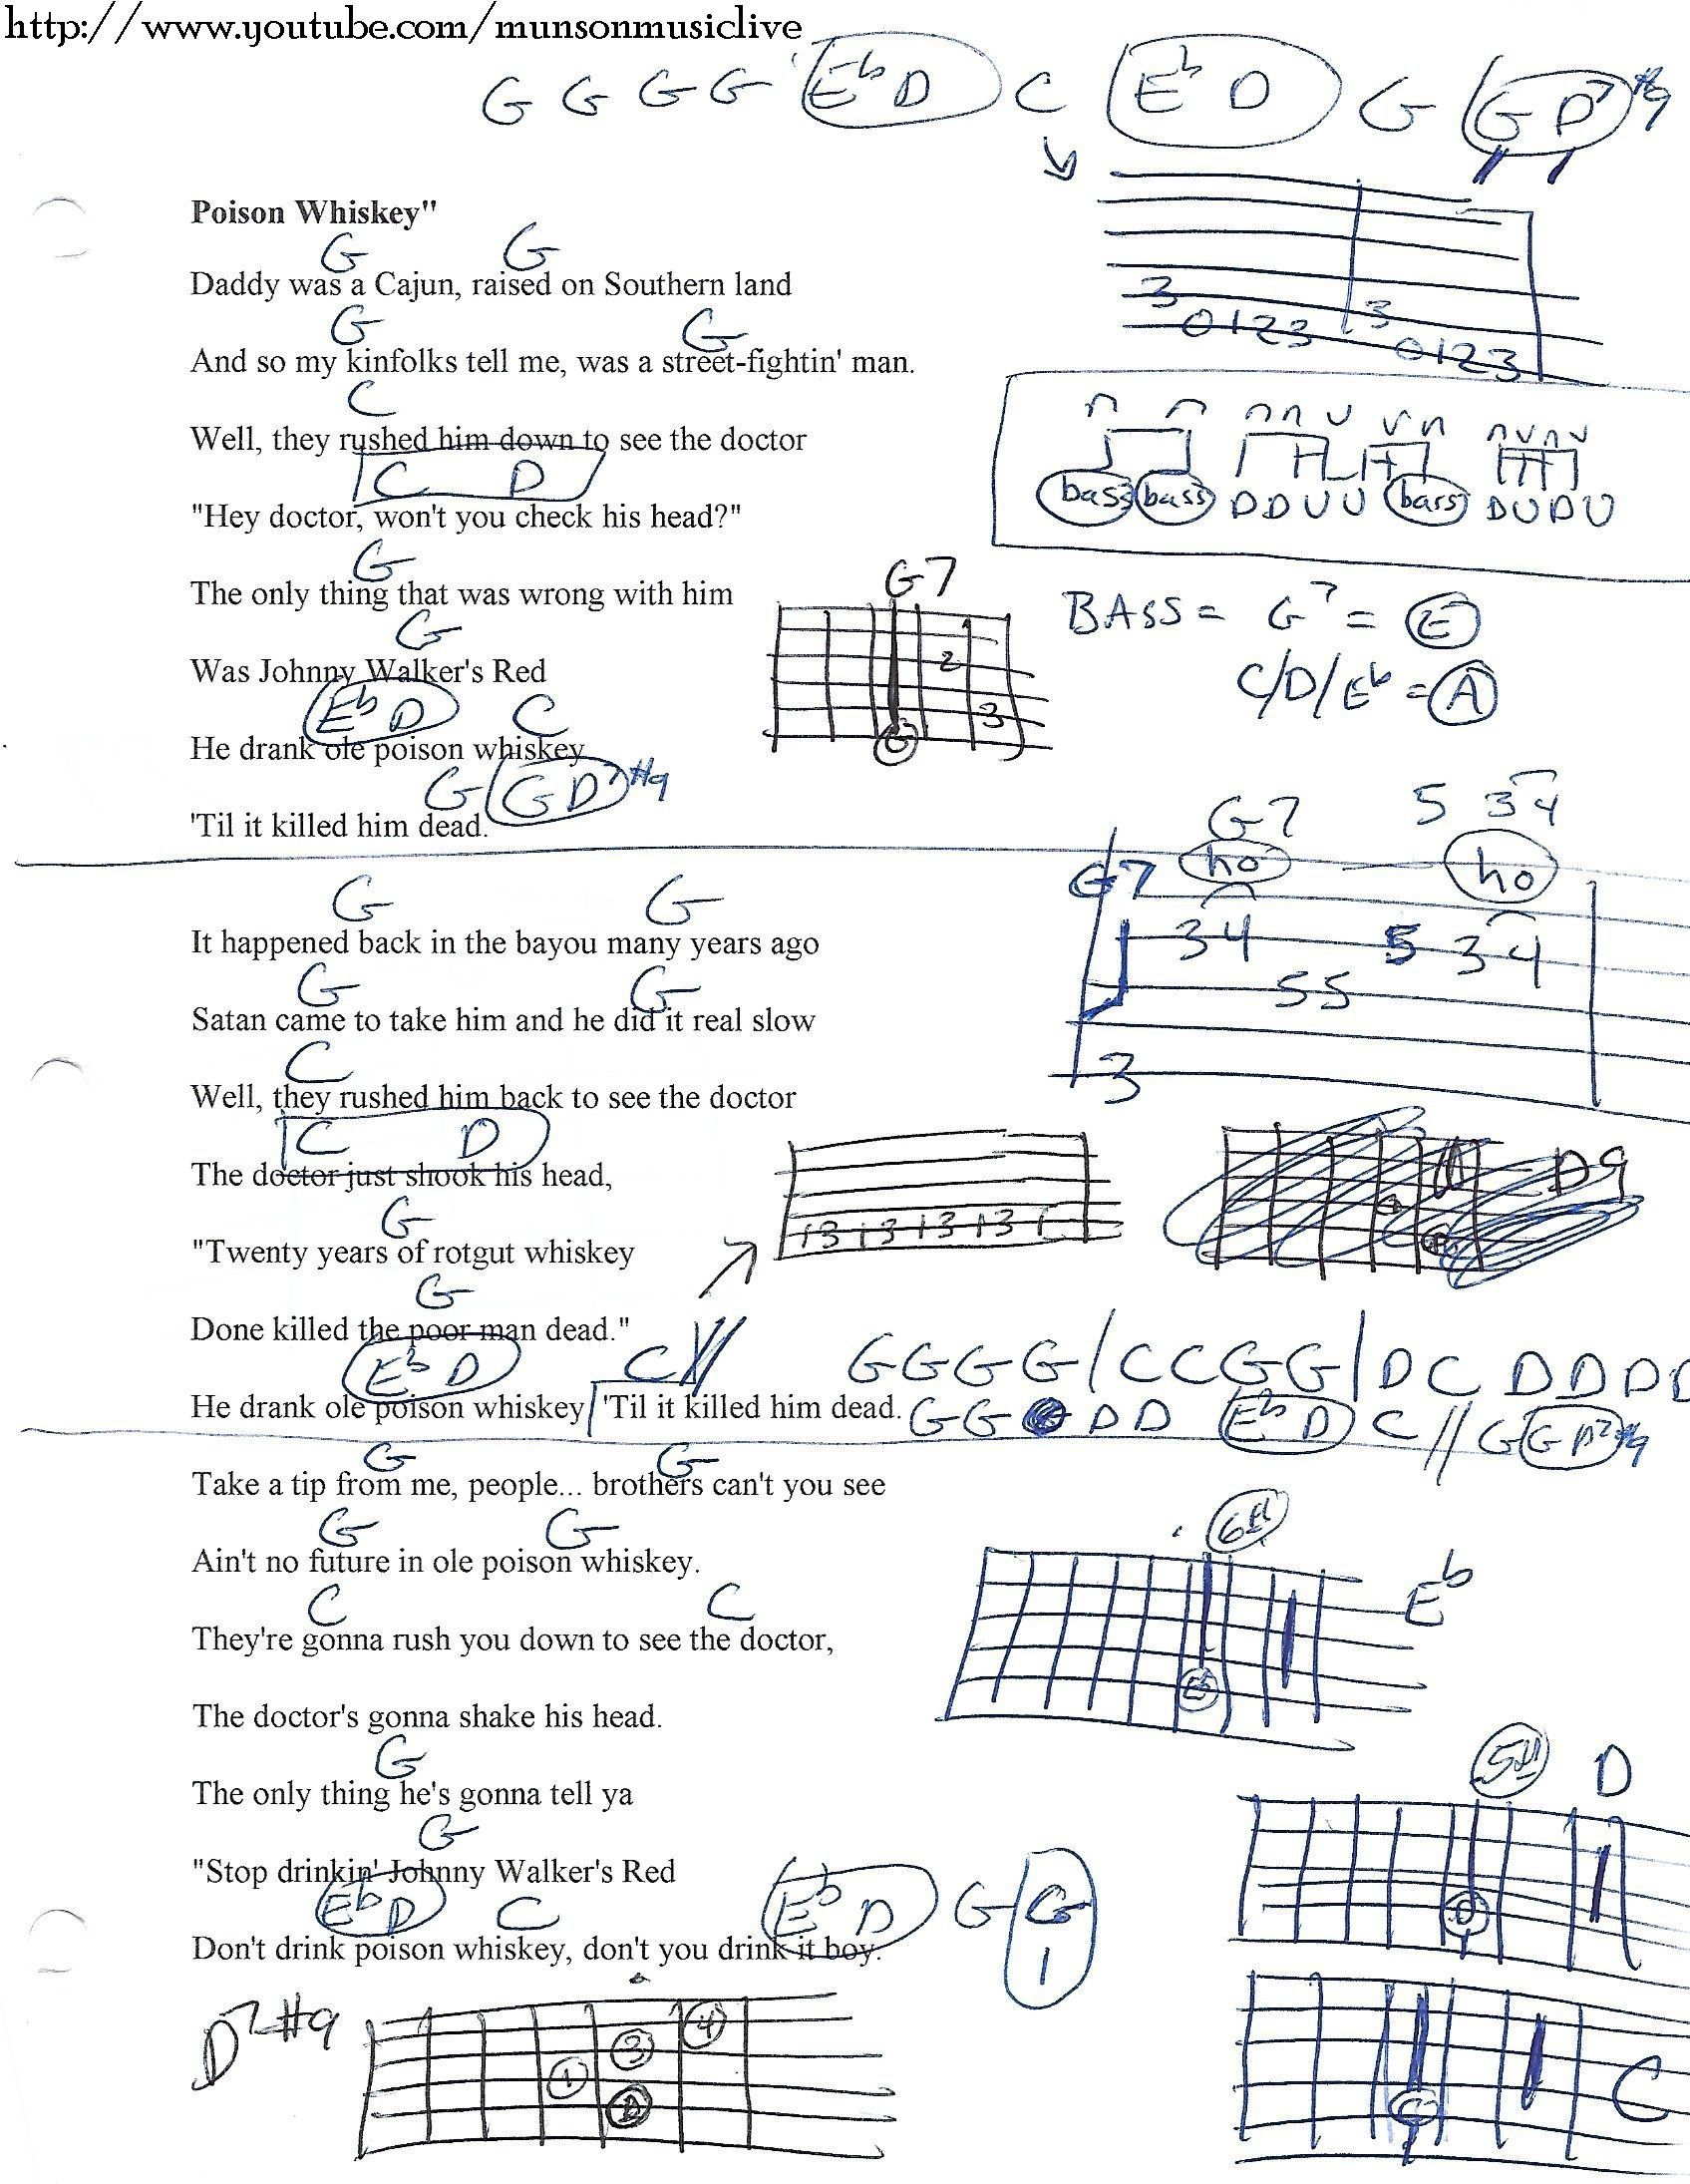 Poison whiskey lynyrd skynyrd guitar chord chart guitar lesson poison whiskey lynyrd skynyrd guitar chord chart hexwebz Images